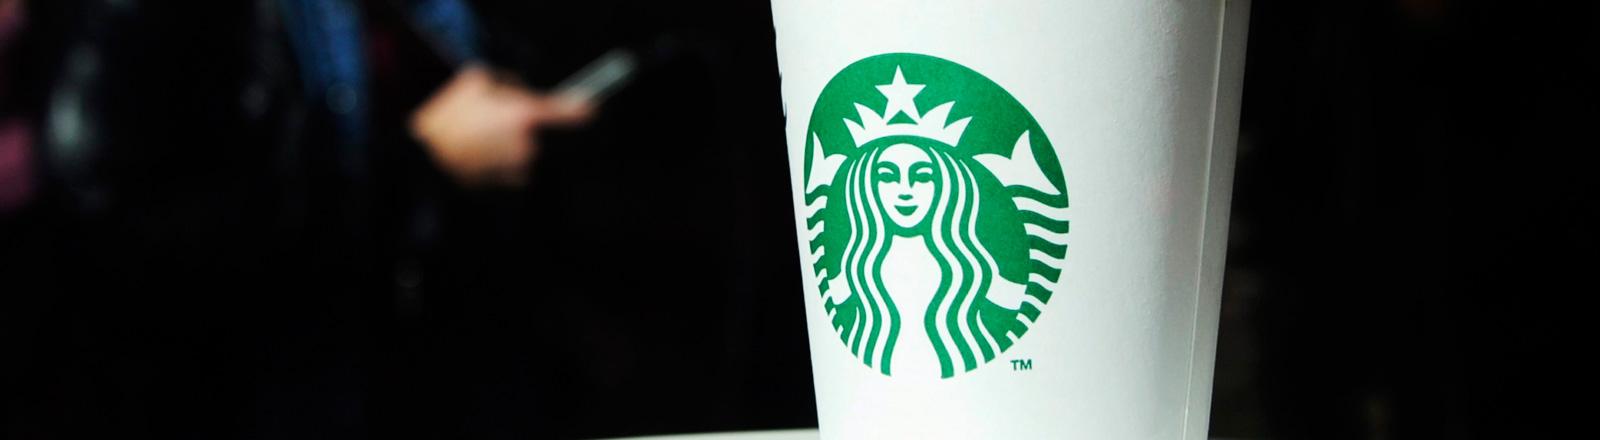 Starbucks-Becher